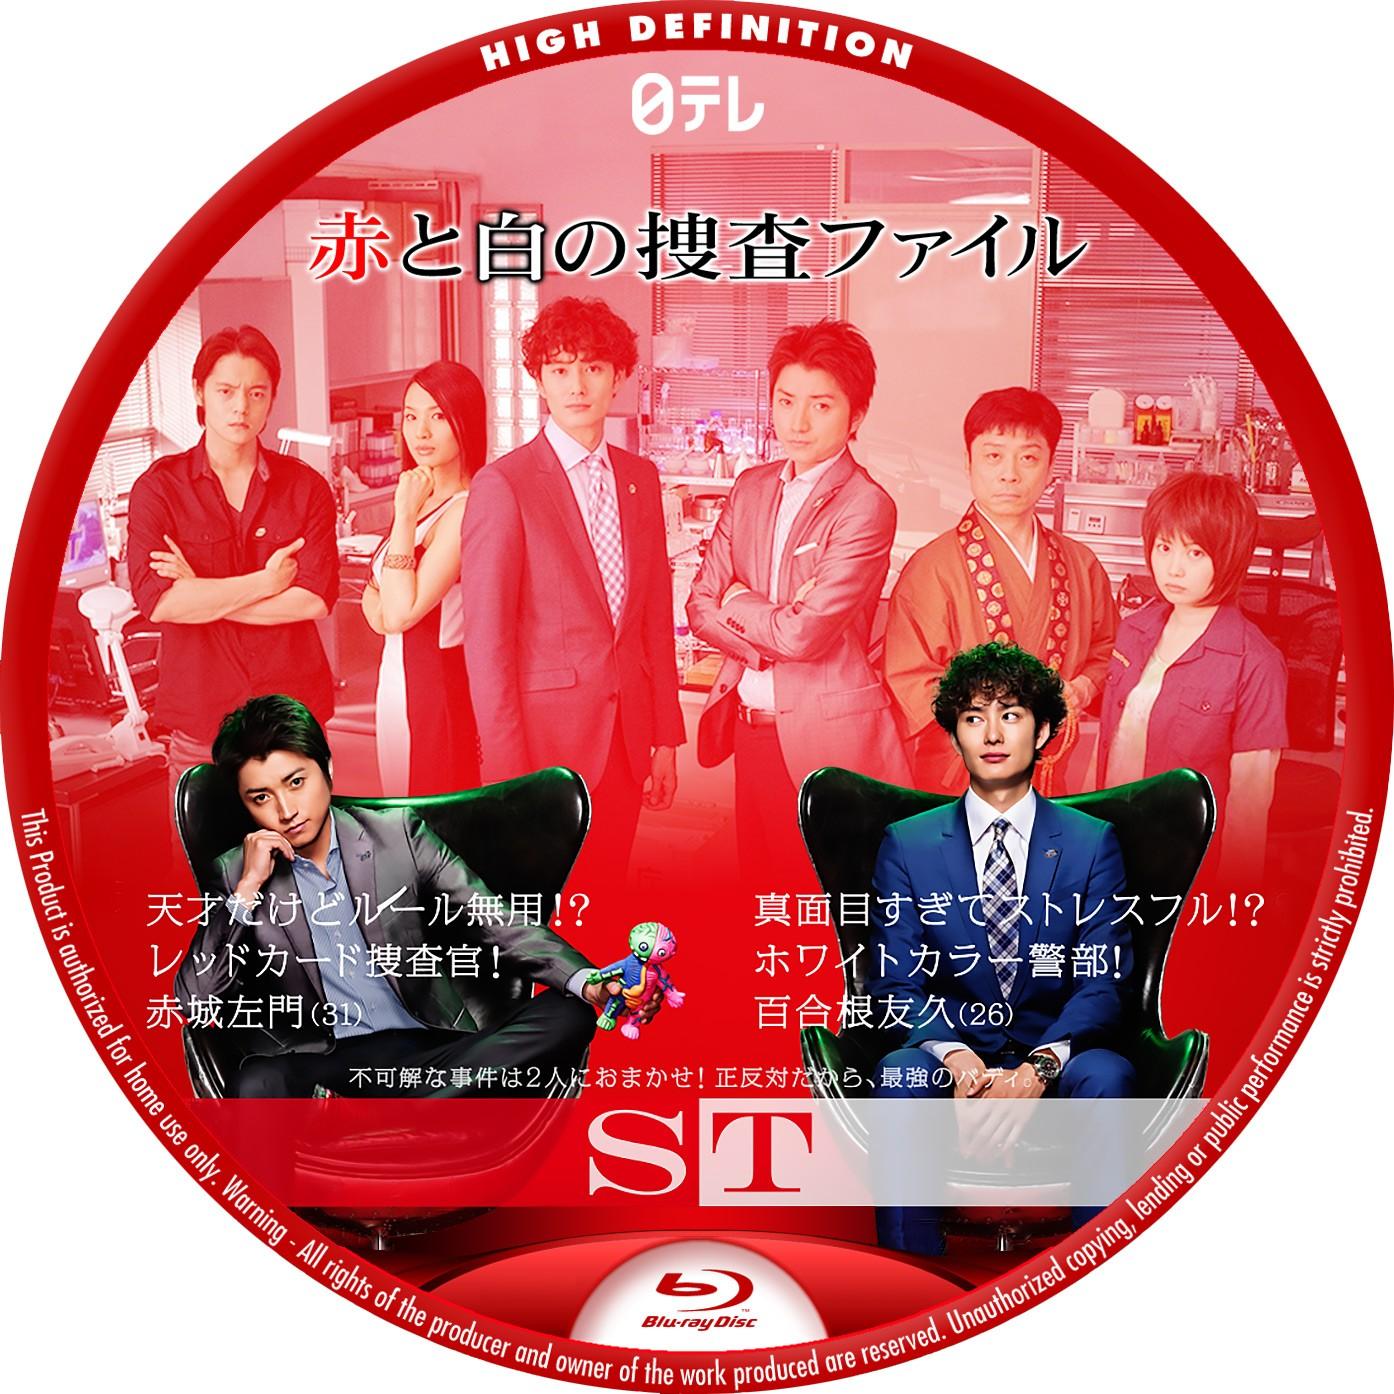 ST 赤と白の捜査ファイル Blu-ray BDラベル